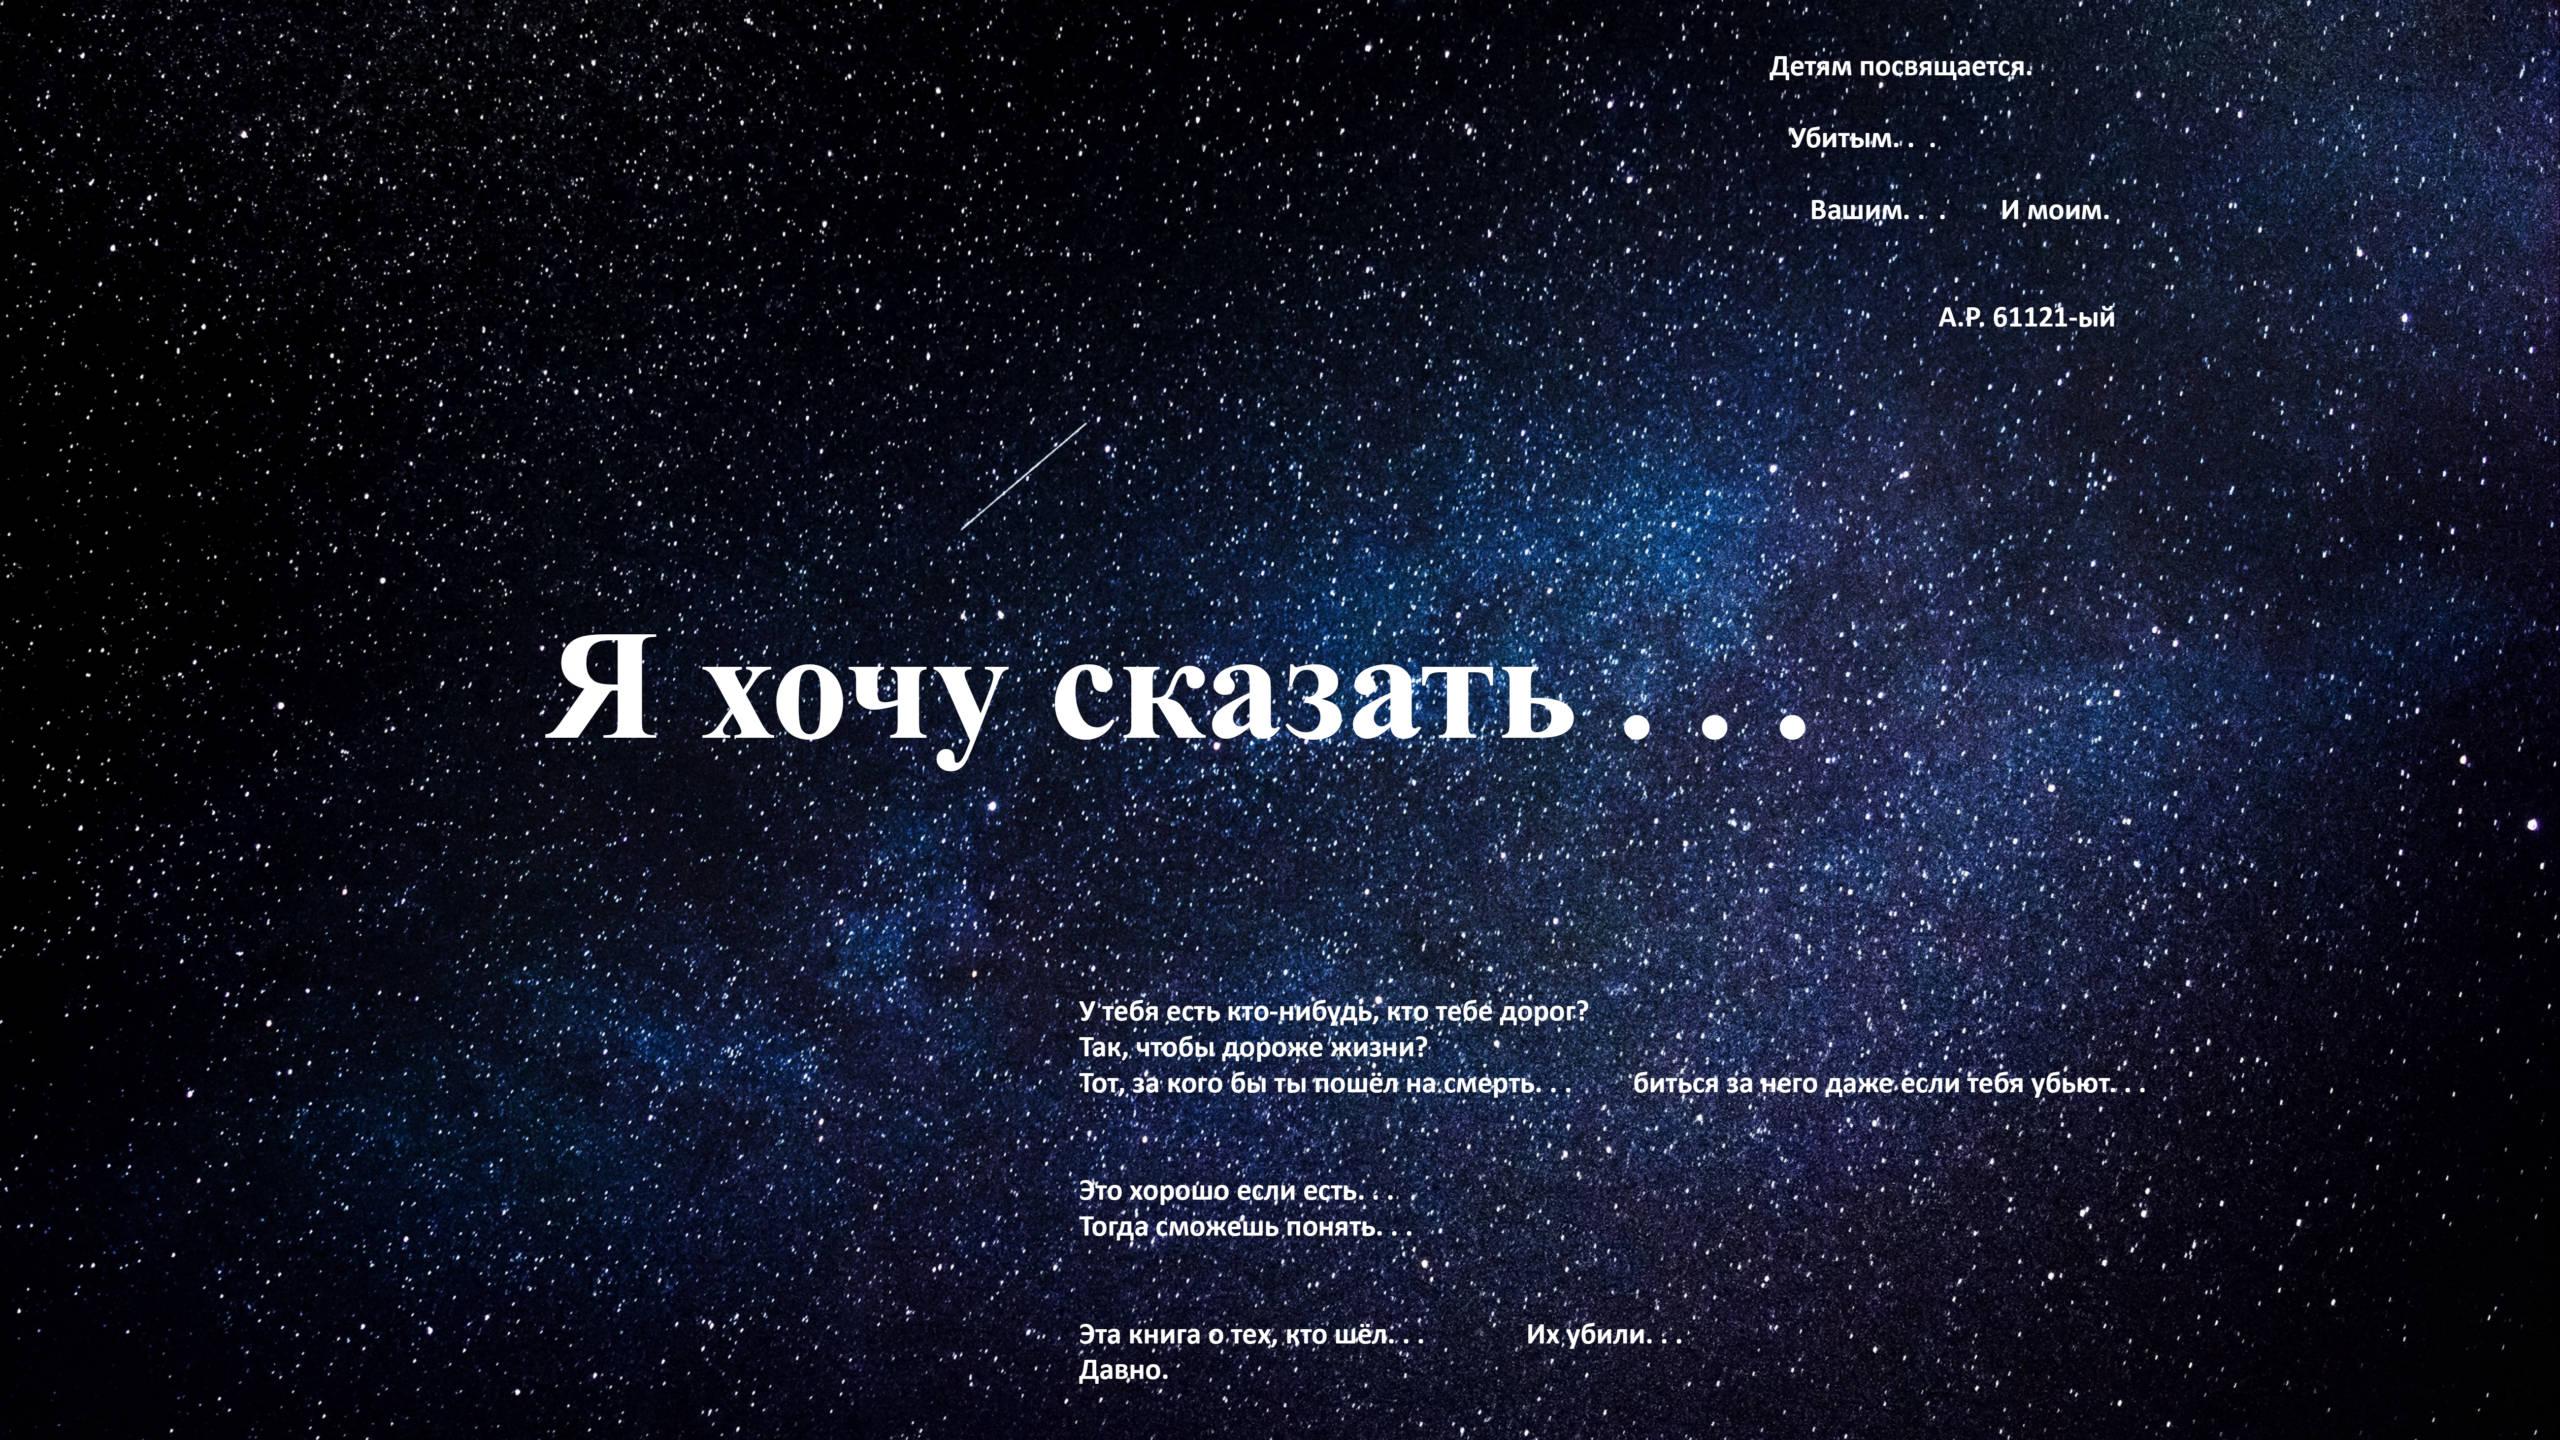 zvezdnoe_nebo_5198_2924--scaled